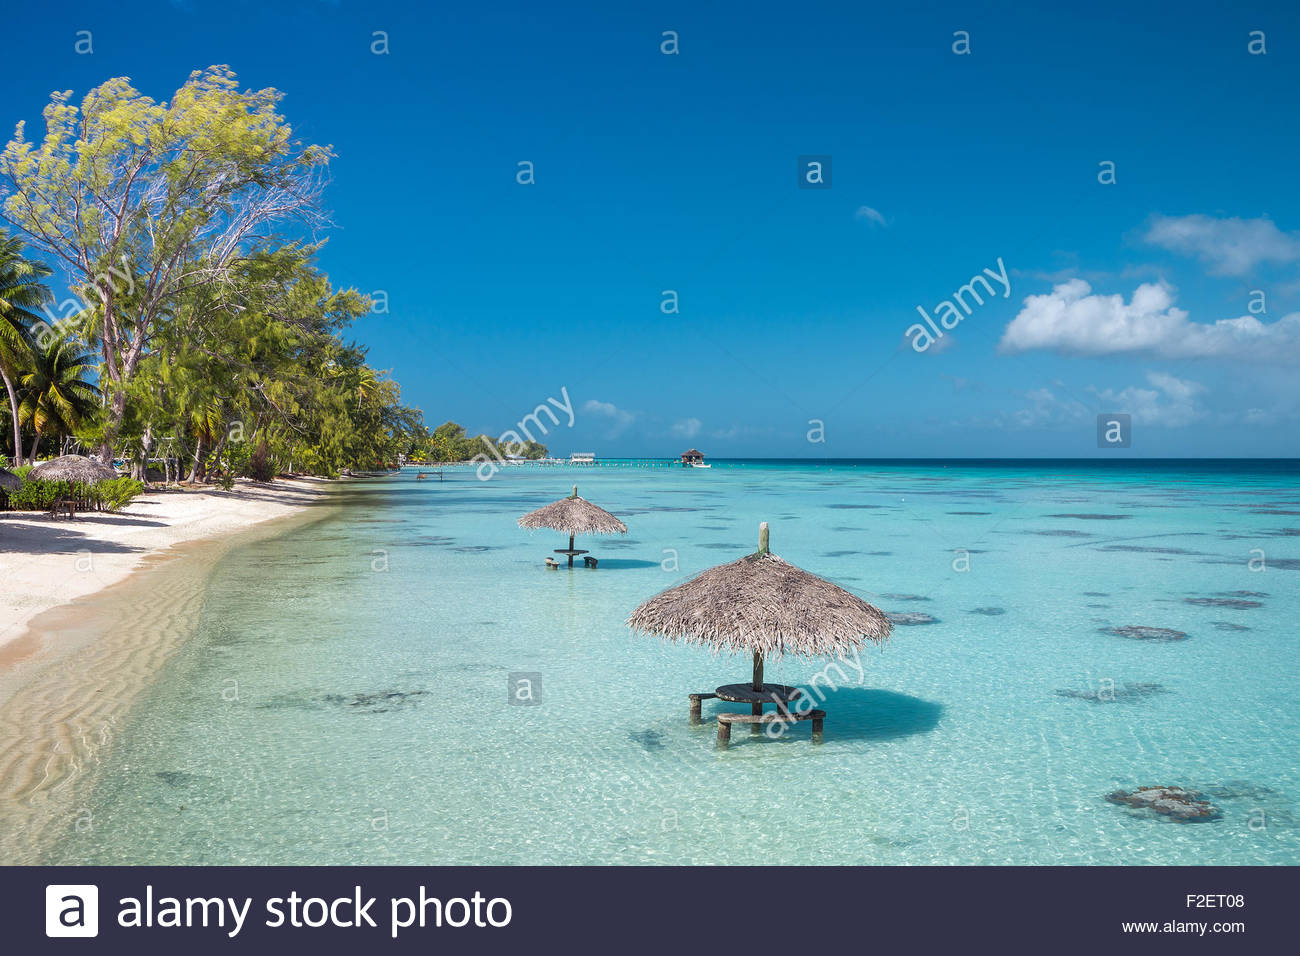 fakarava-french-polynesia-F2ET08.jpg